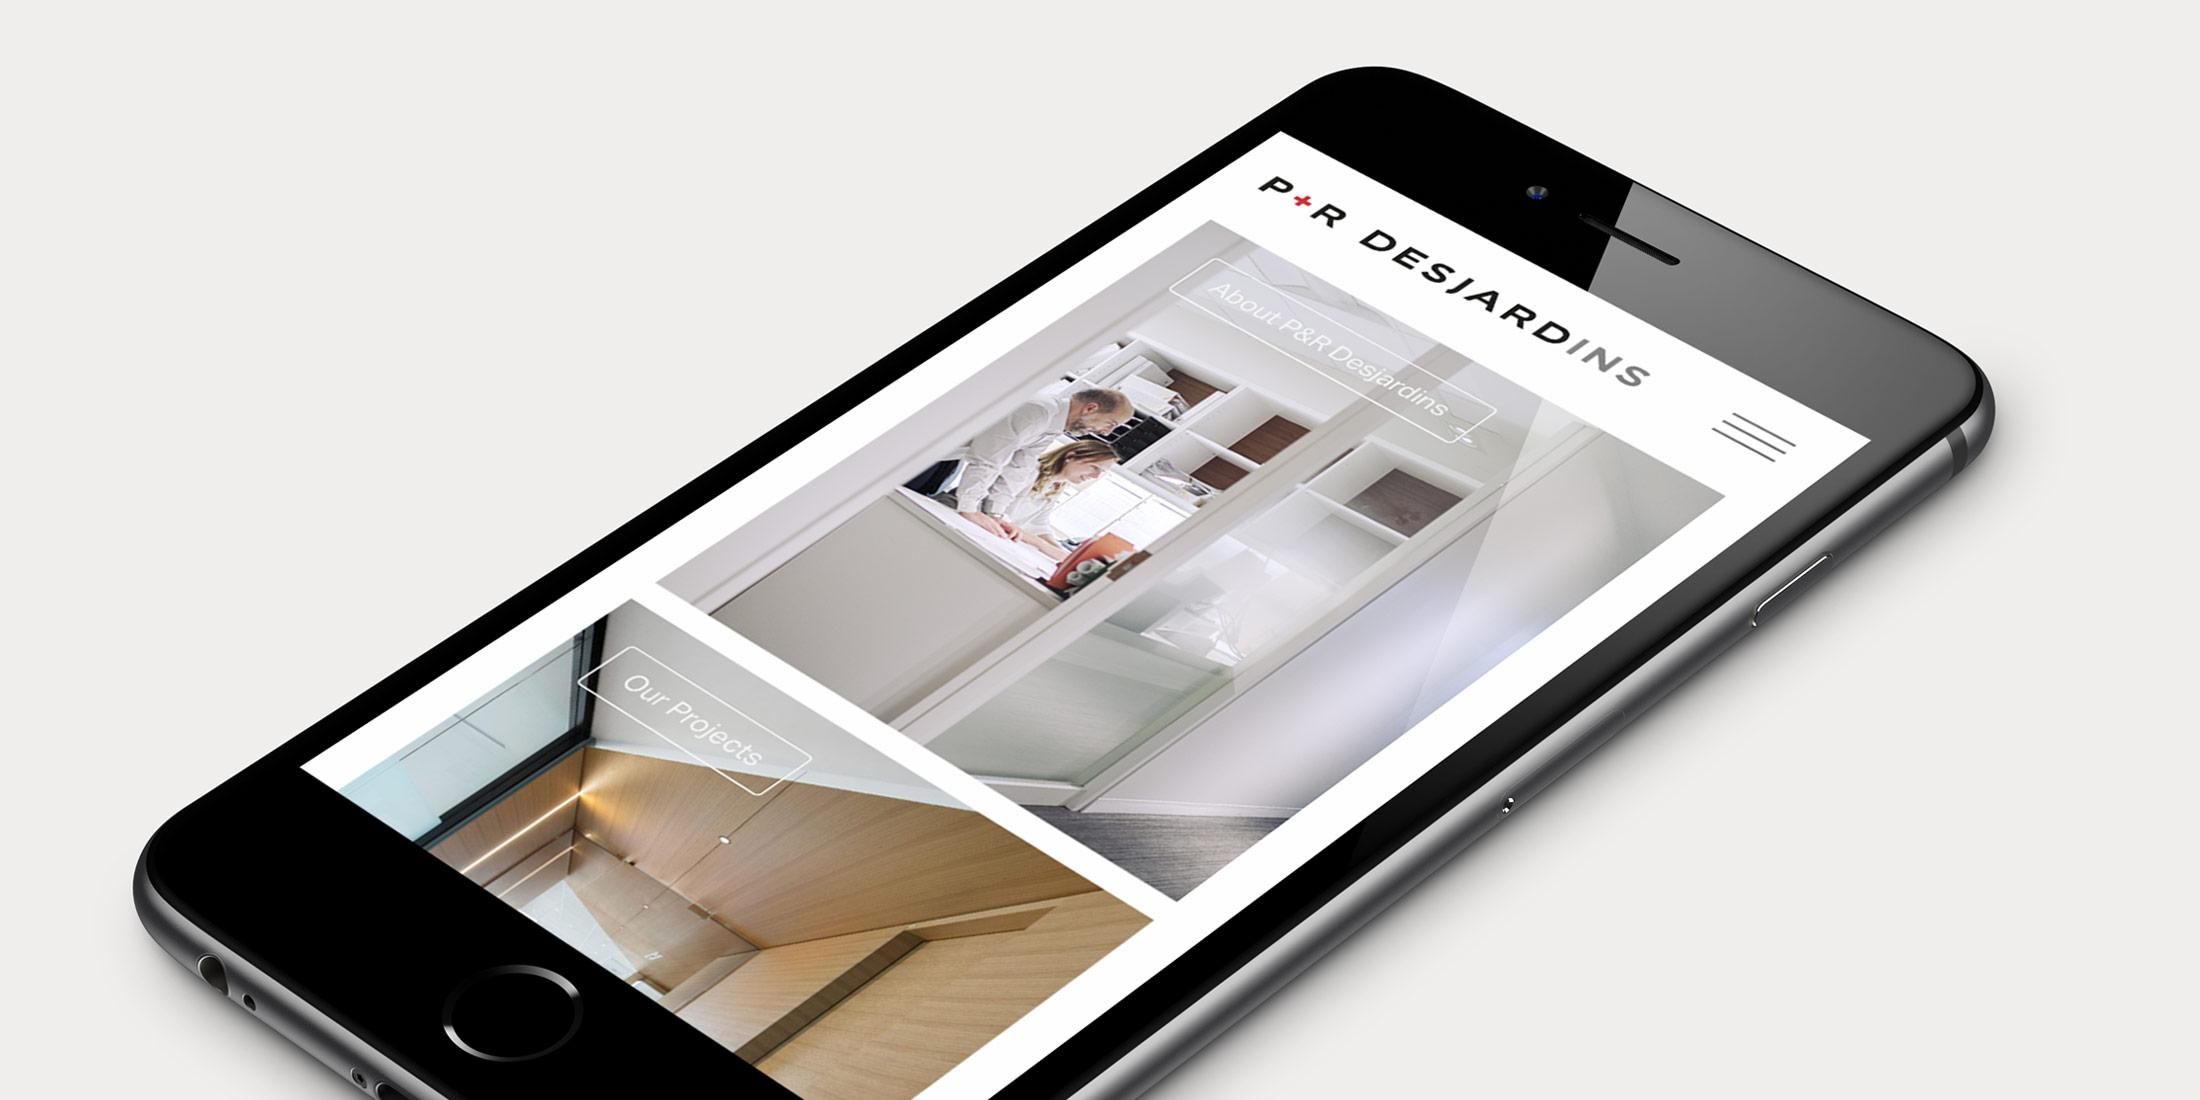 Mobile version of the P&R Desjardins website